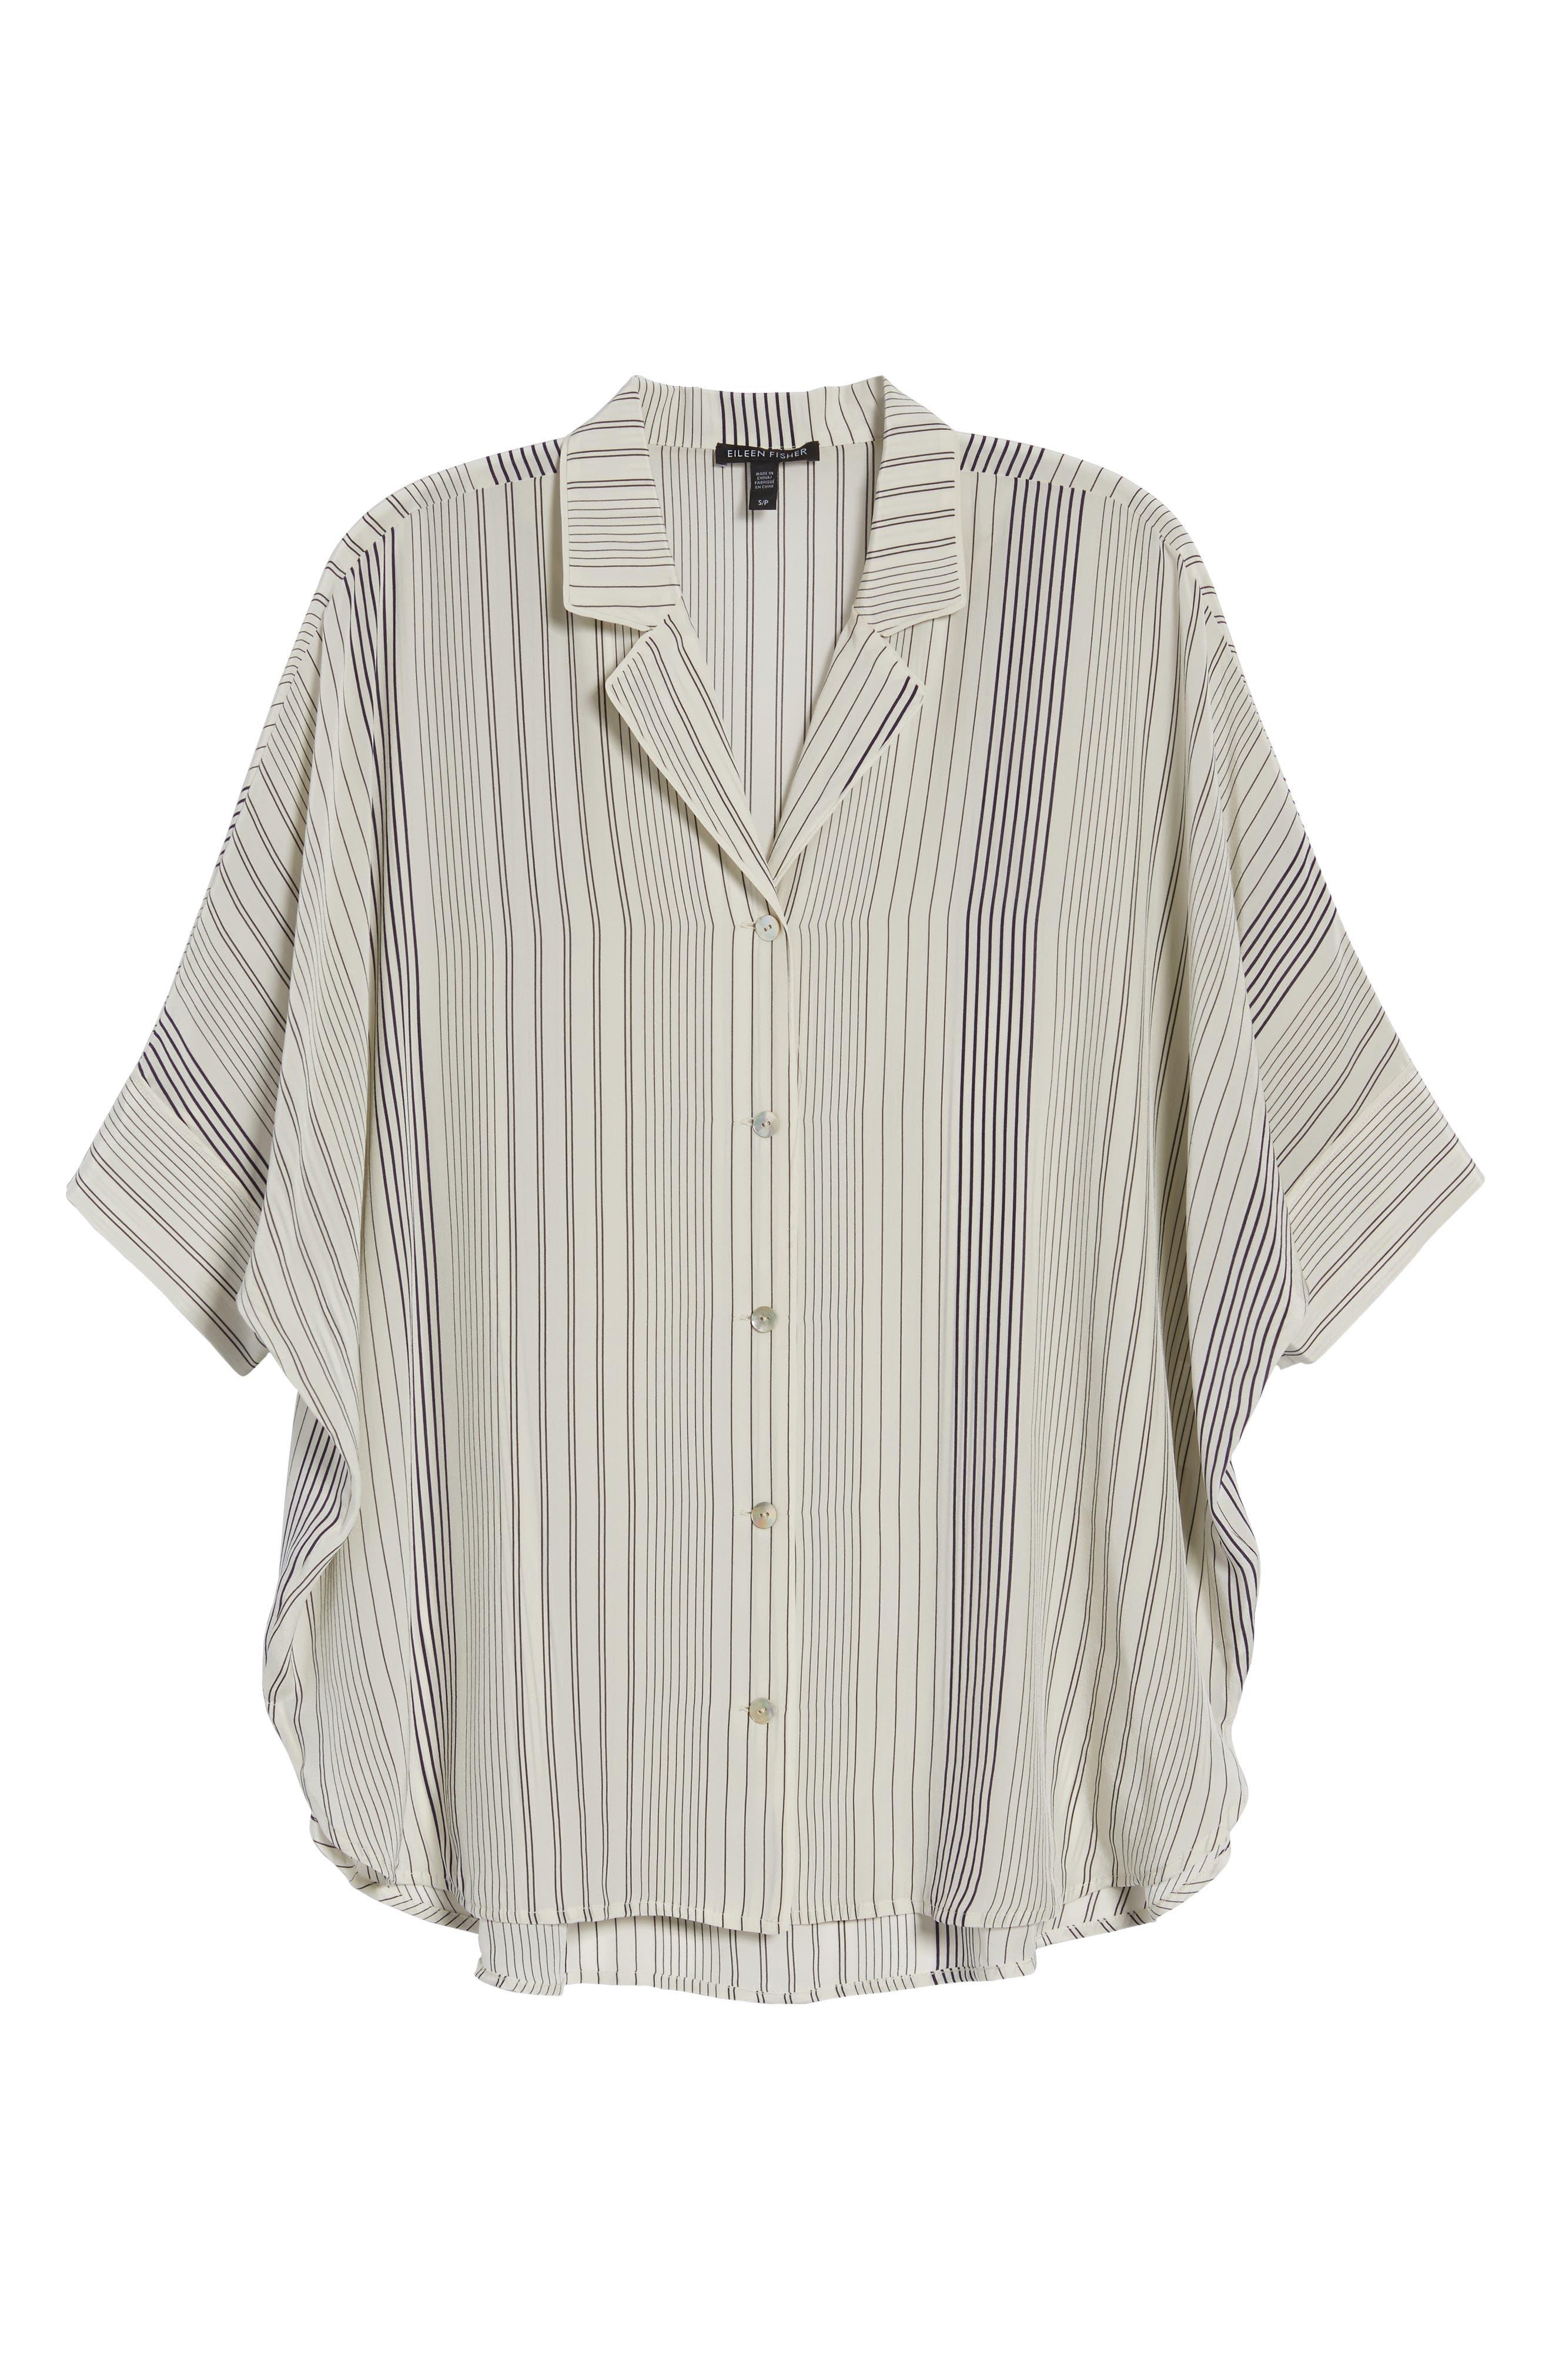 Stripe Silk Shirt,                             Alternate thumbnail 7, color,                             907